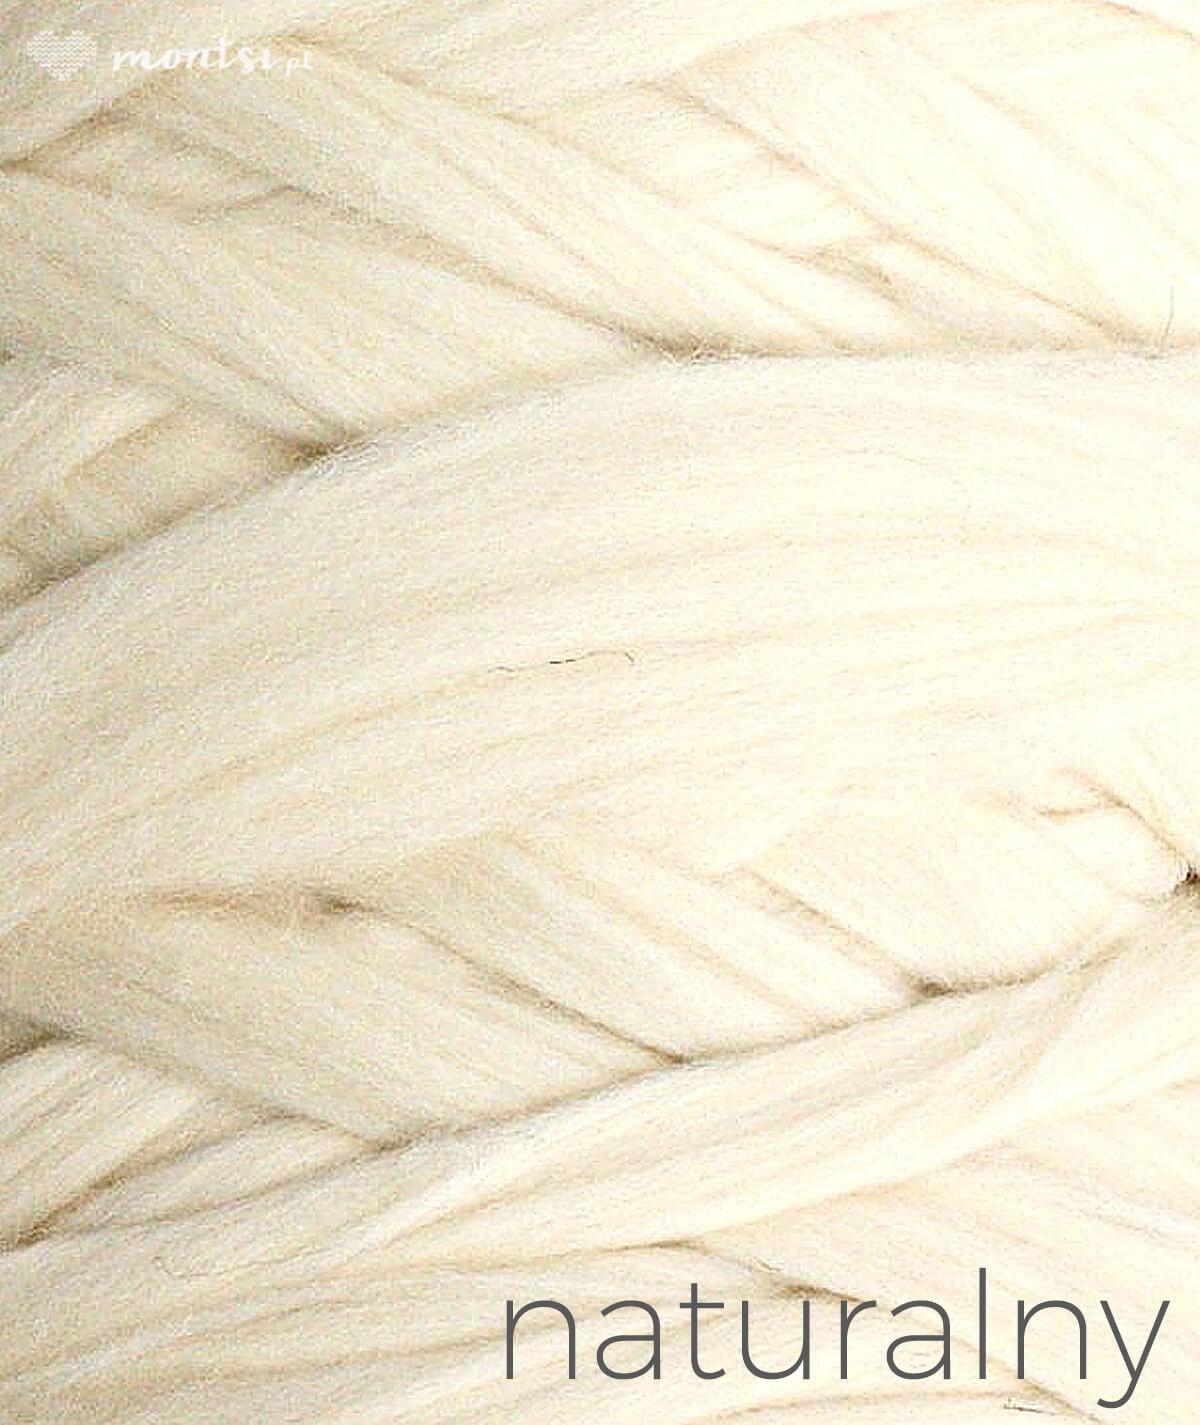 MrBulky koc z wełny czesankowej - kolor naturalny